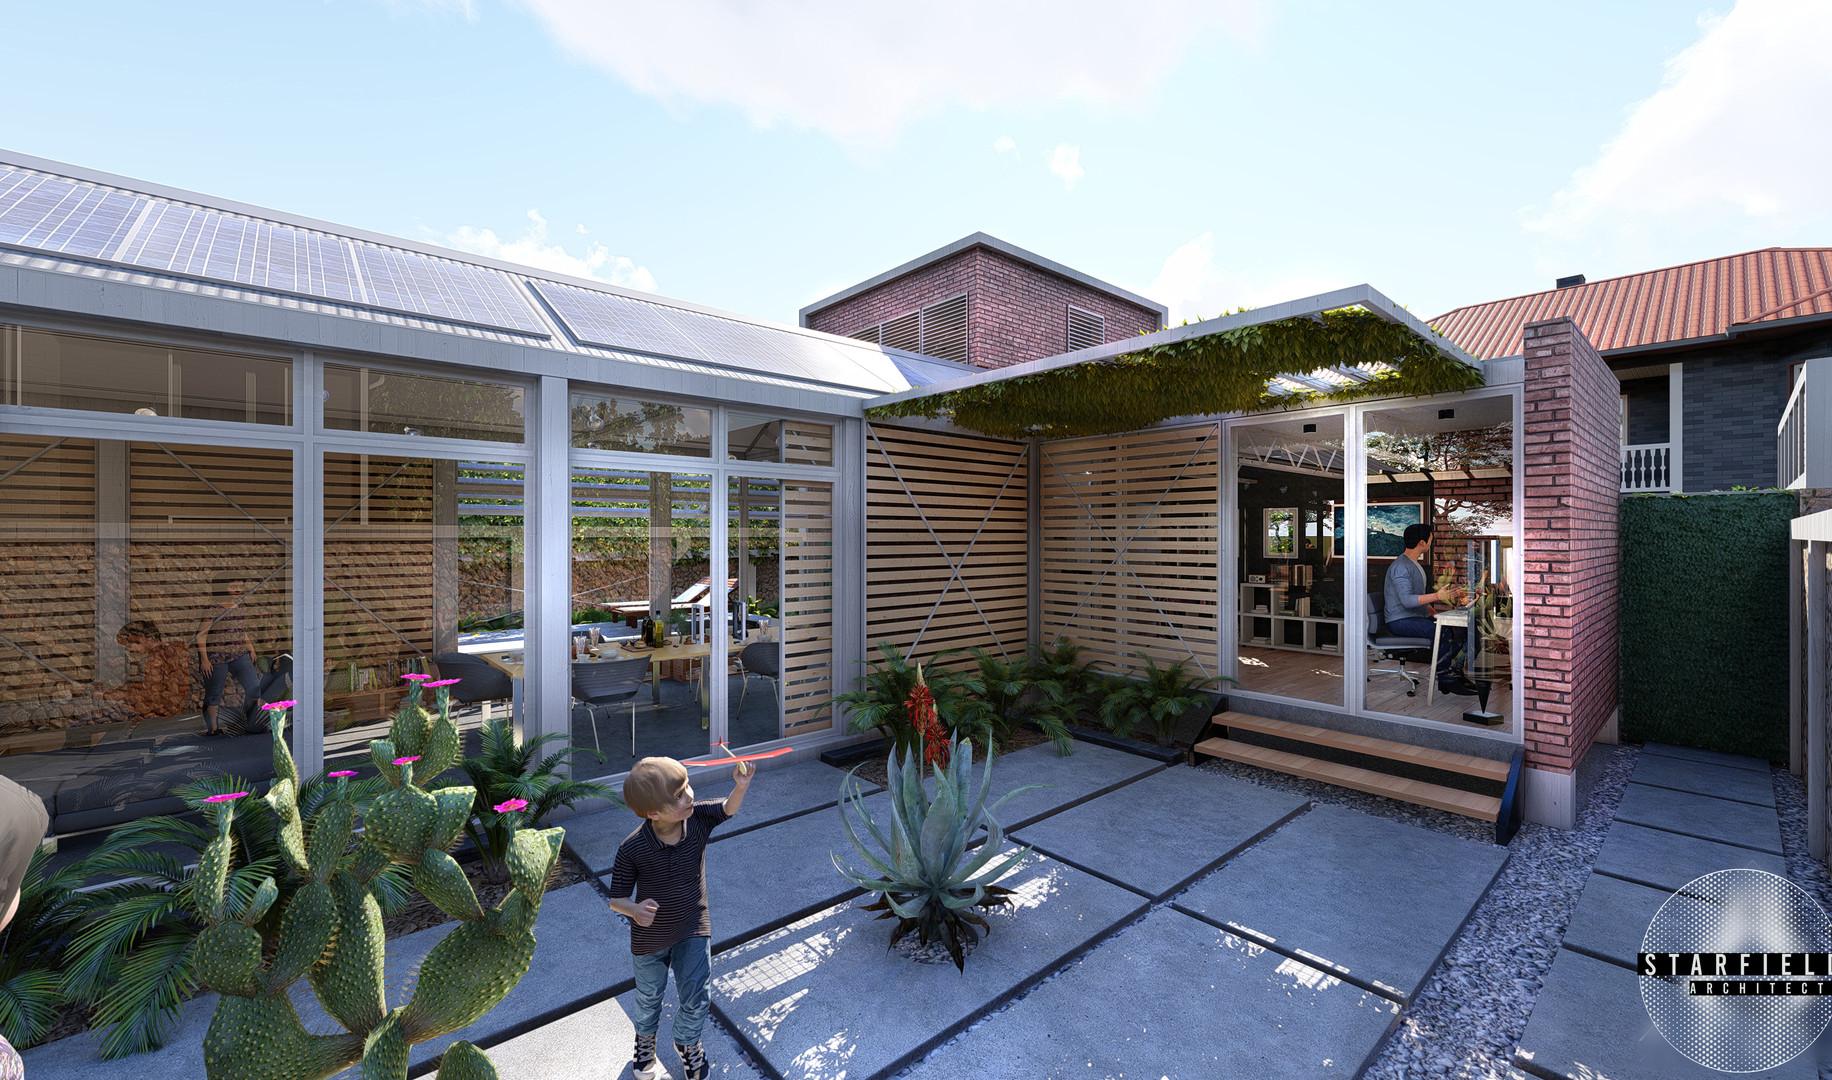 Arise_Architects_House Meyer_Render 5.jp